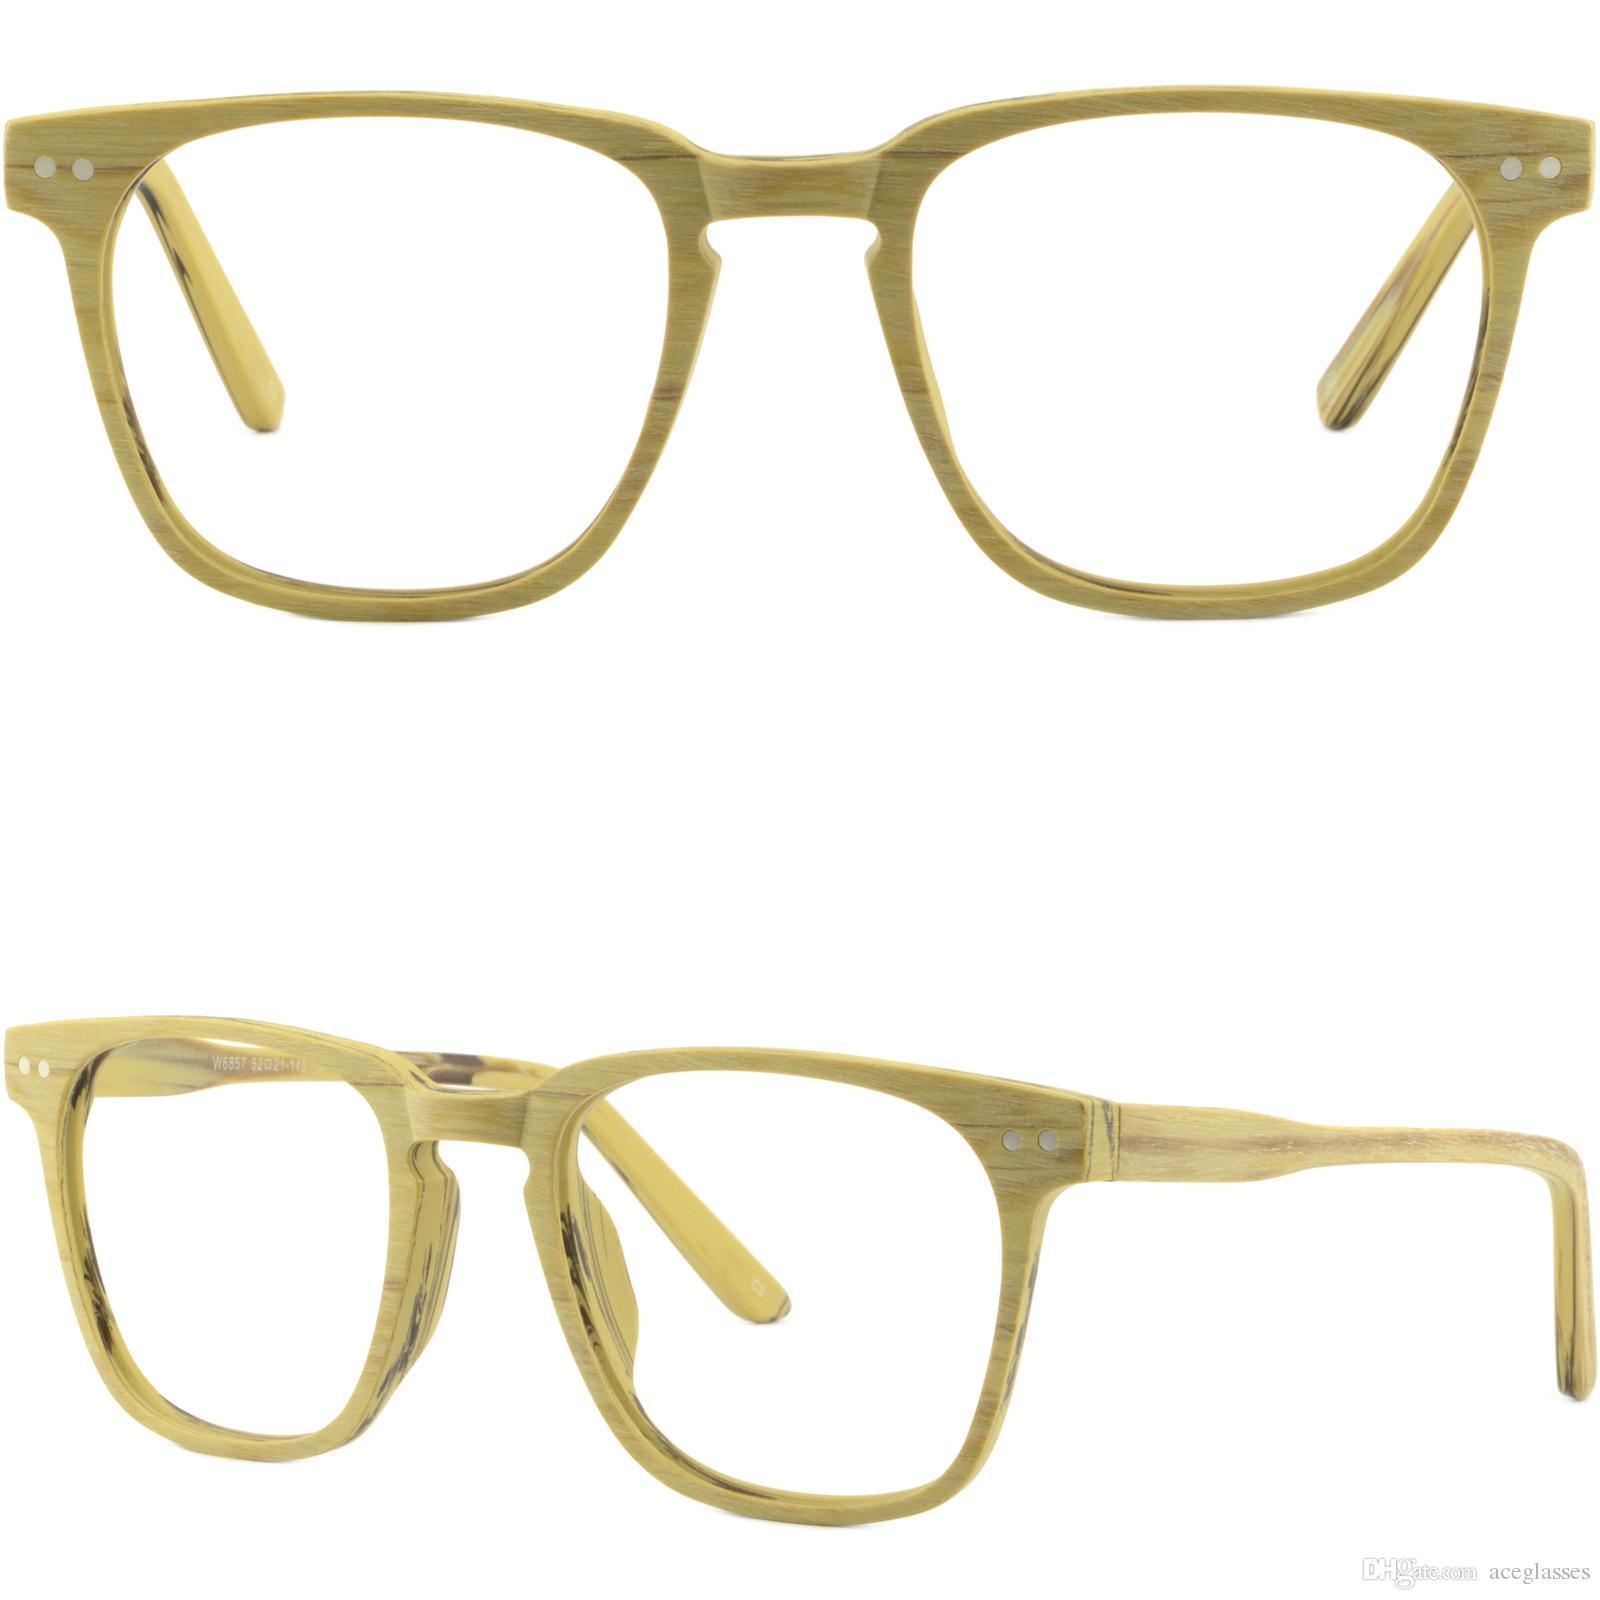 ca9b4b9da08 Brillengestell Fassung Gestell Brille Square Men Women Frames Faux Wood Acetate  Prescription Glasses Silver Dot Pieces Glasses Frame Online with   22.8 Piece ...